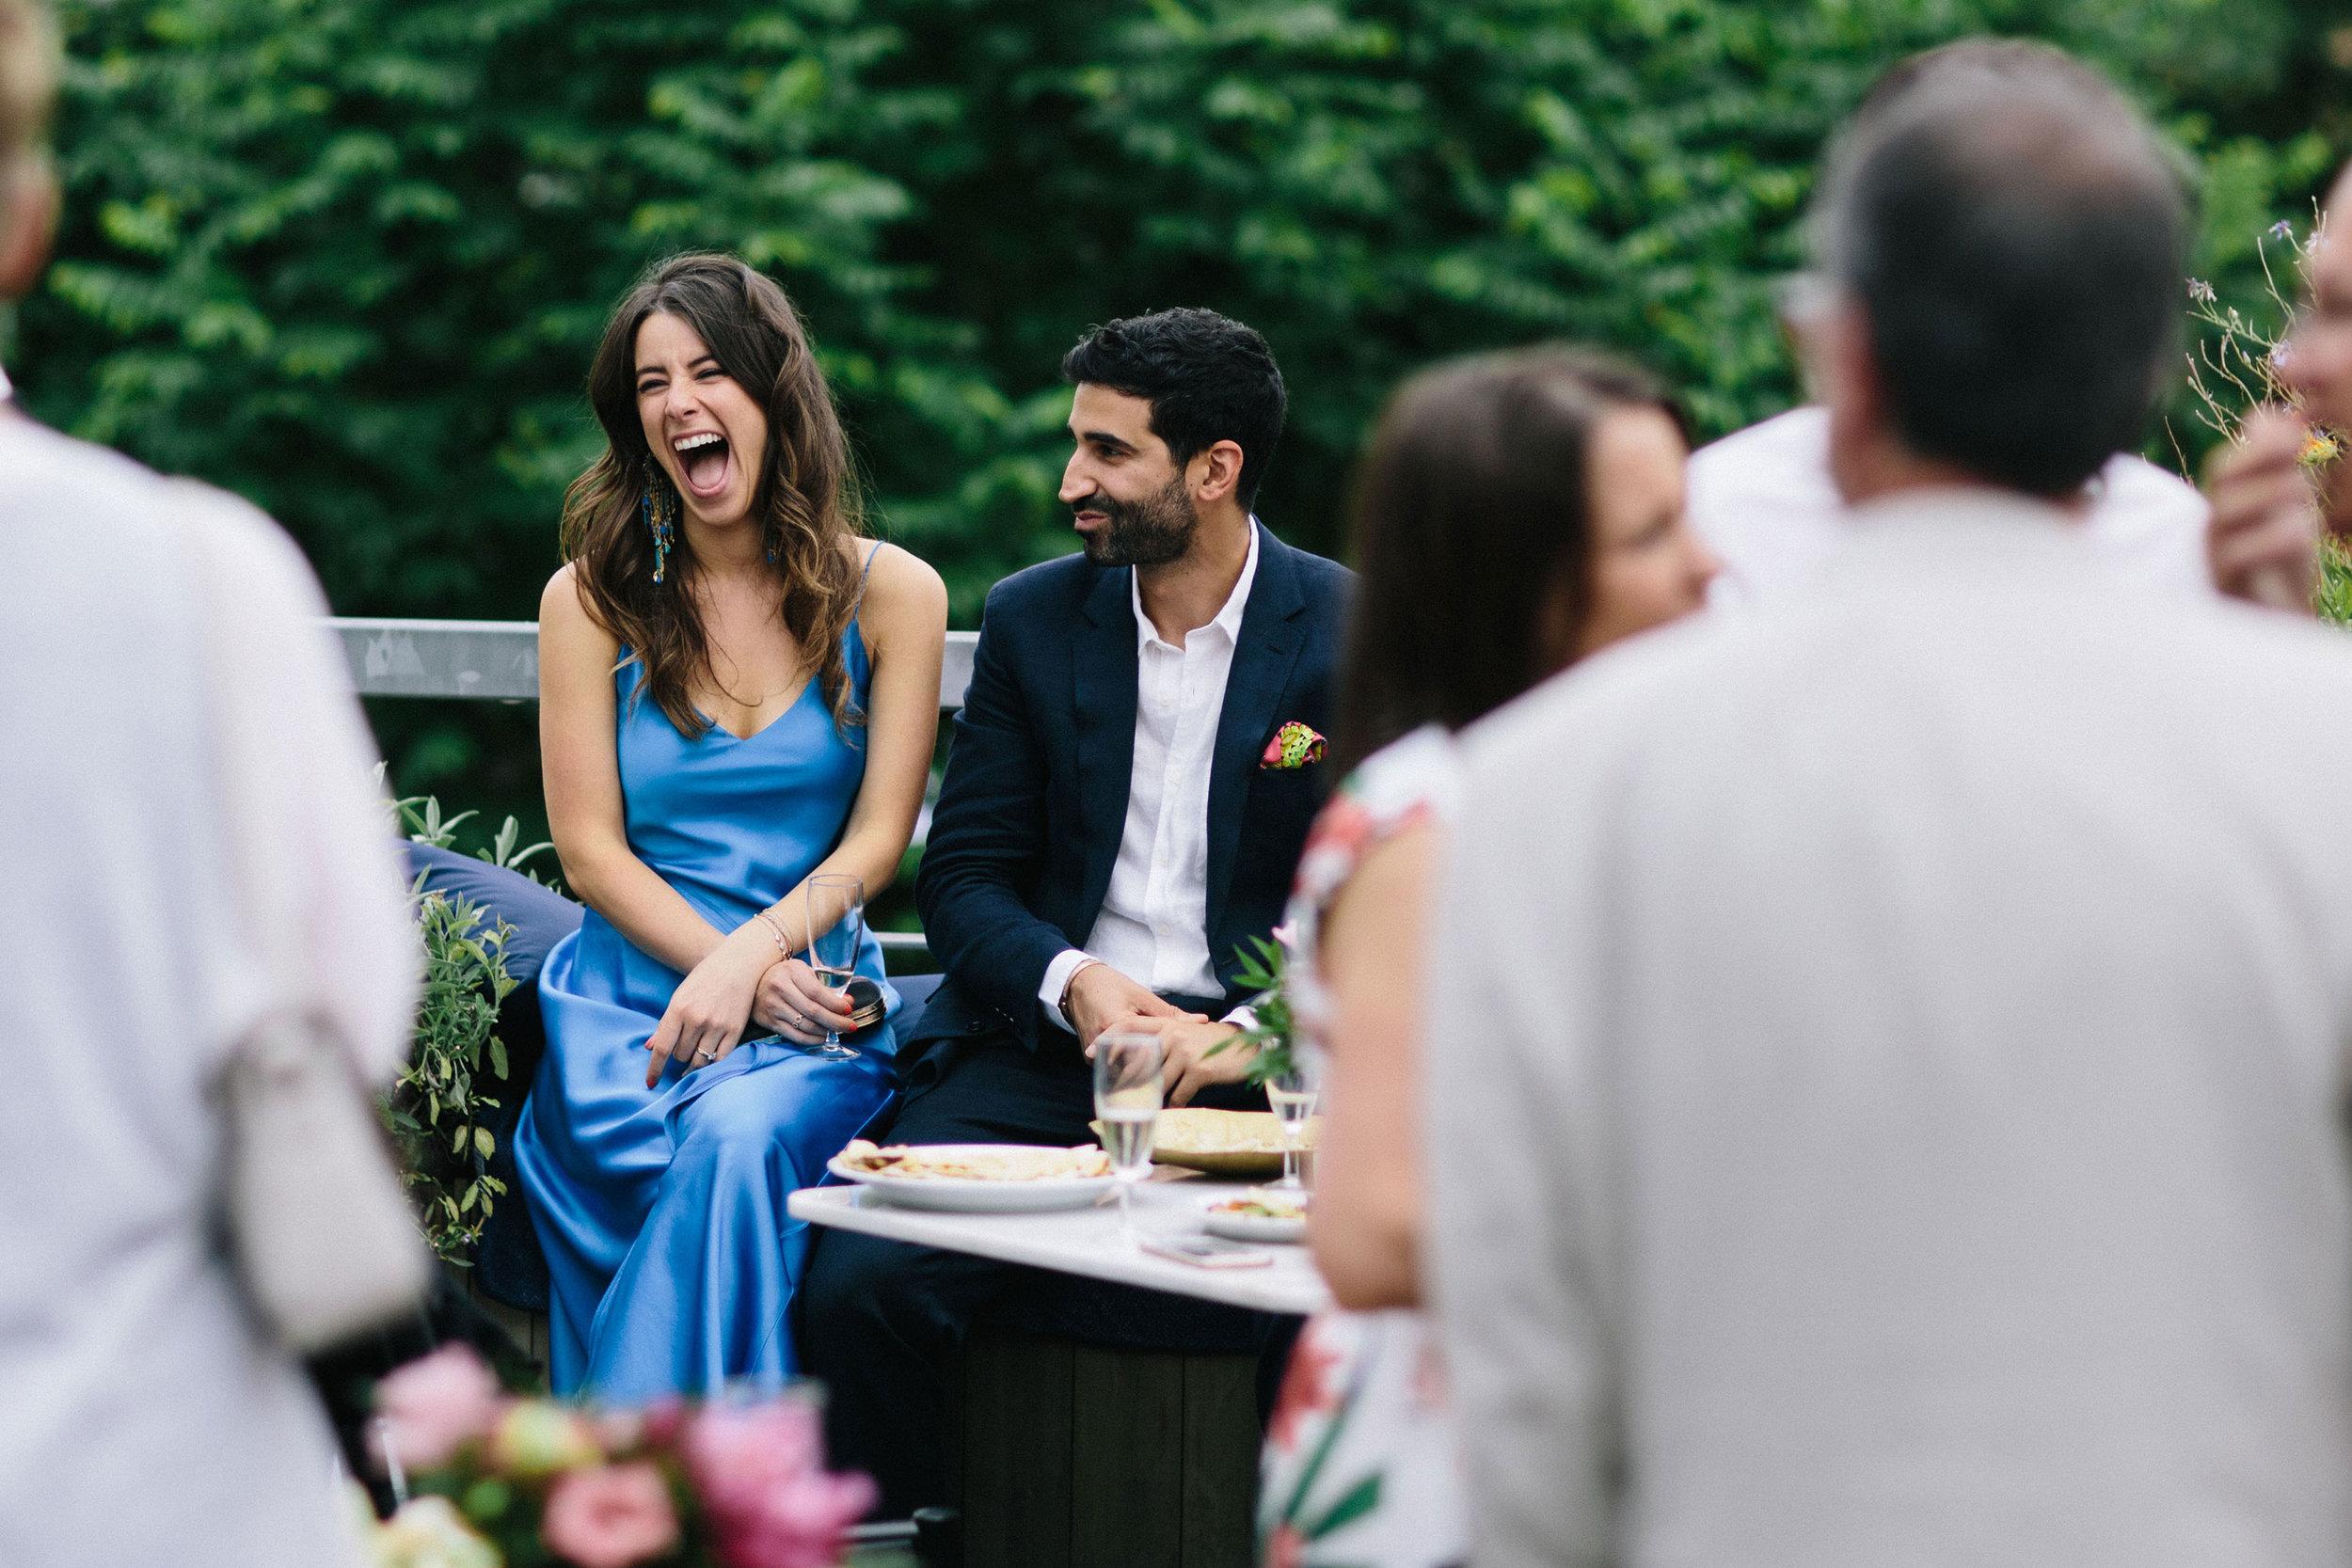 West-London-wedding-party-in-Ladbroke-Grove-Michael-Newington-Gray-29.jpg